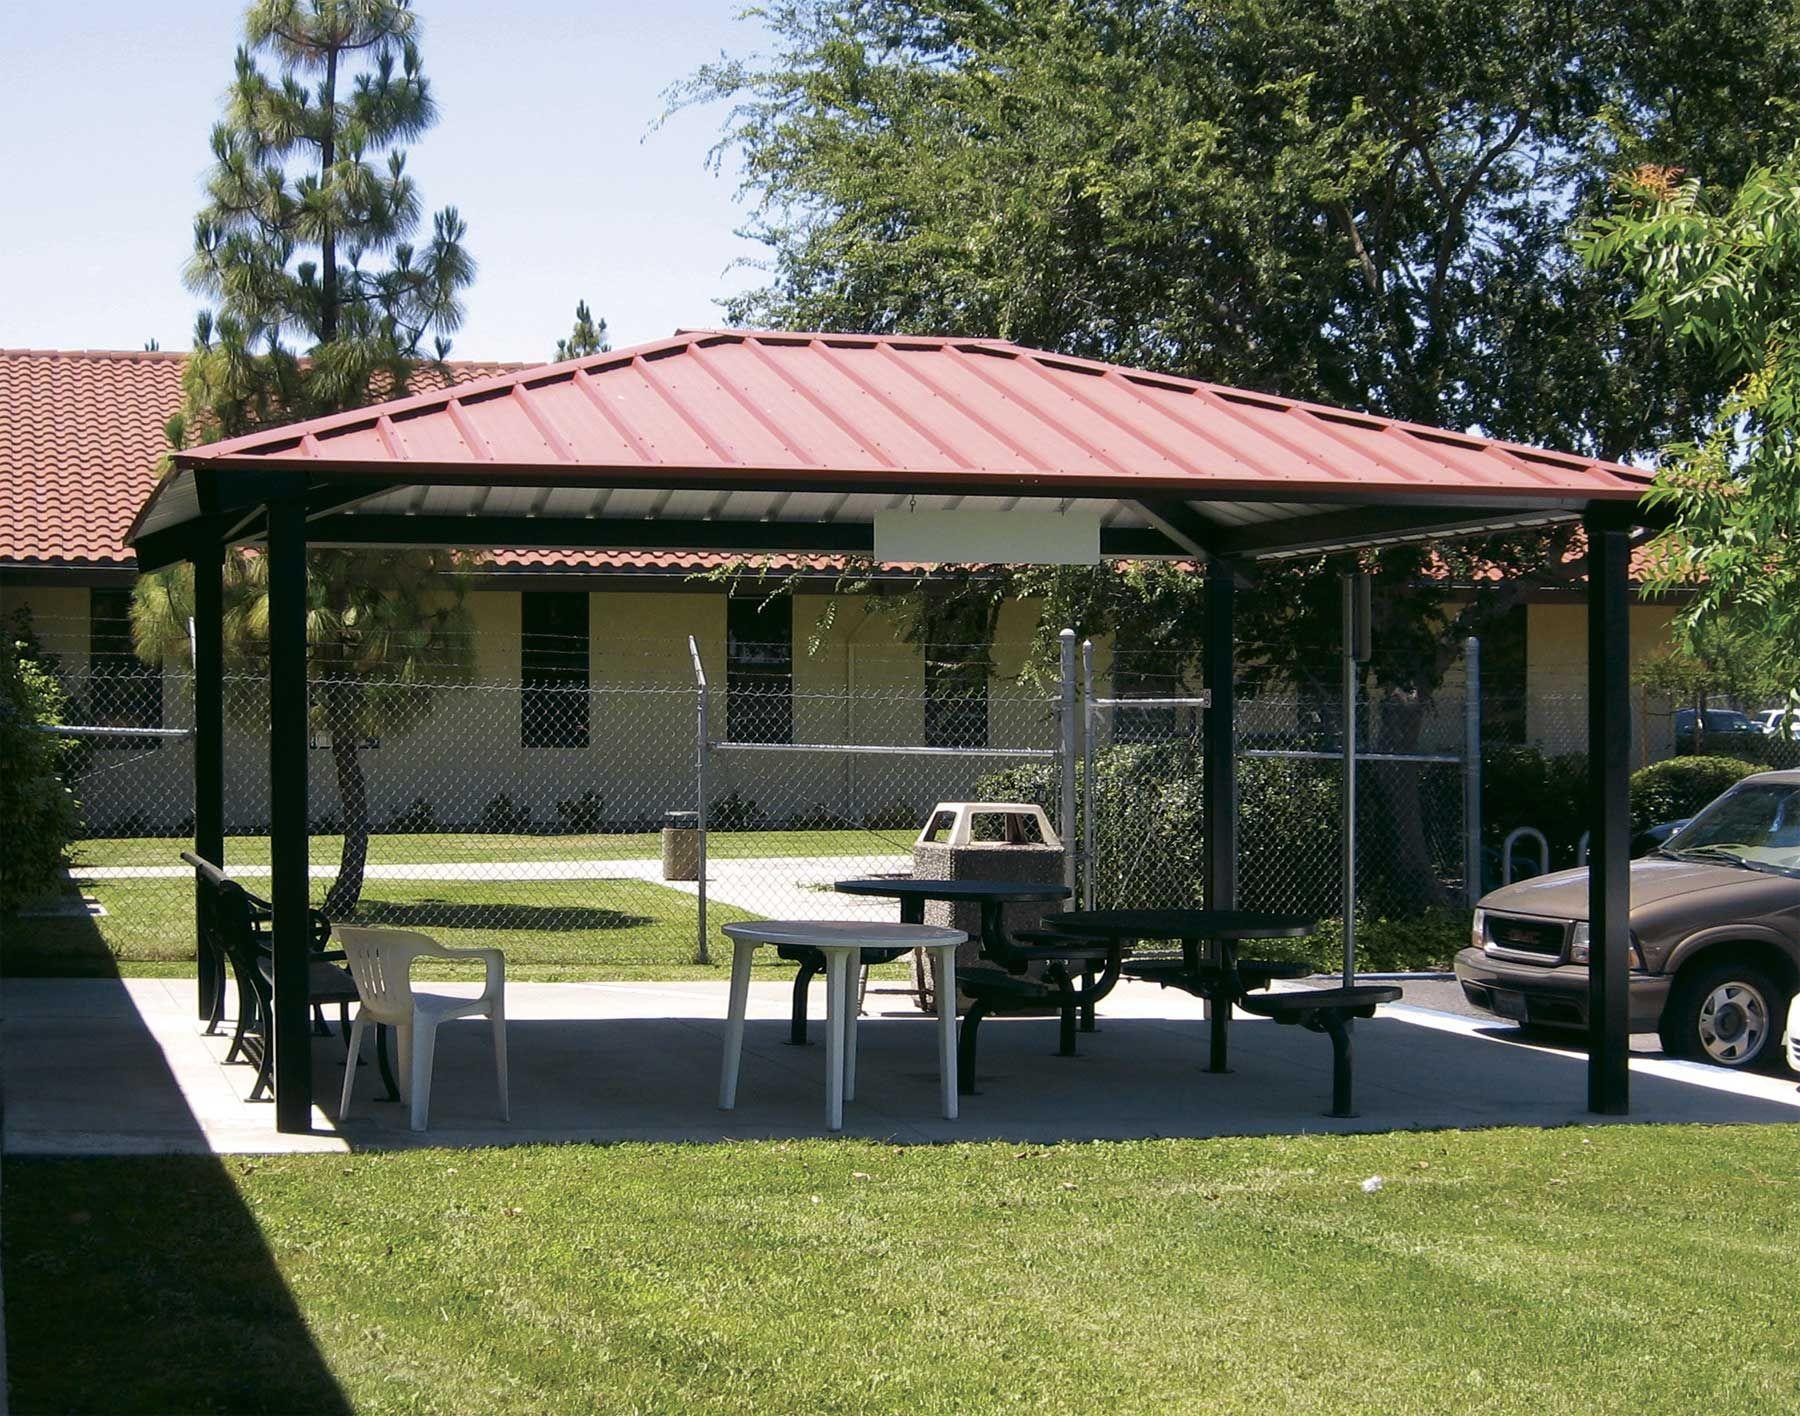 Metal Roof Metal Roof Pavilions & Metal Roof: Metal Roof Pavilions | Backyard Ideas | Pinterest ...